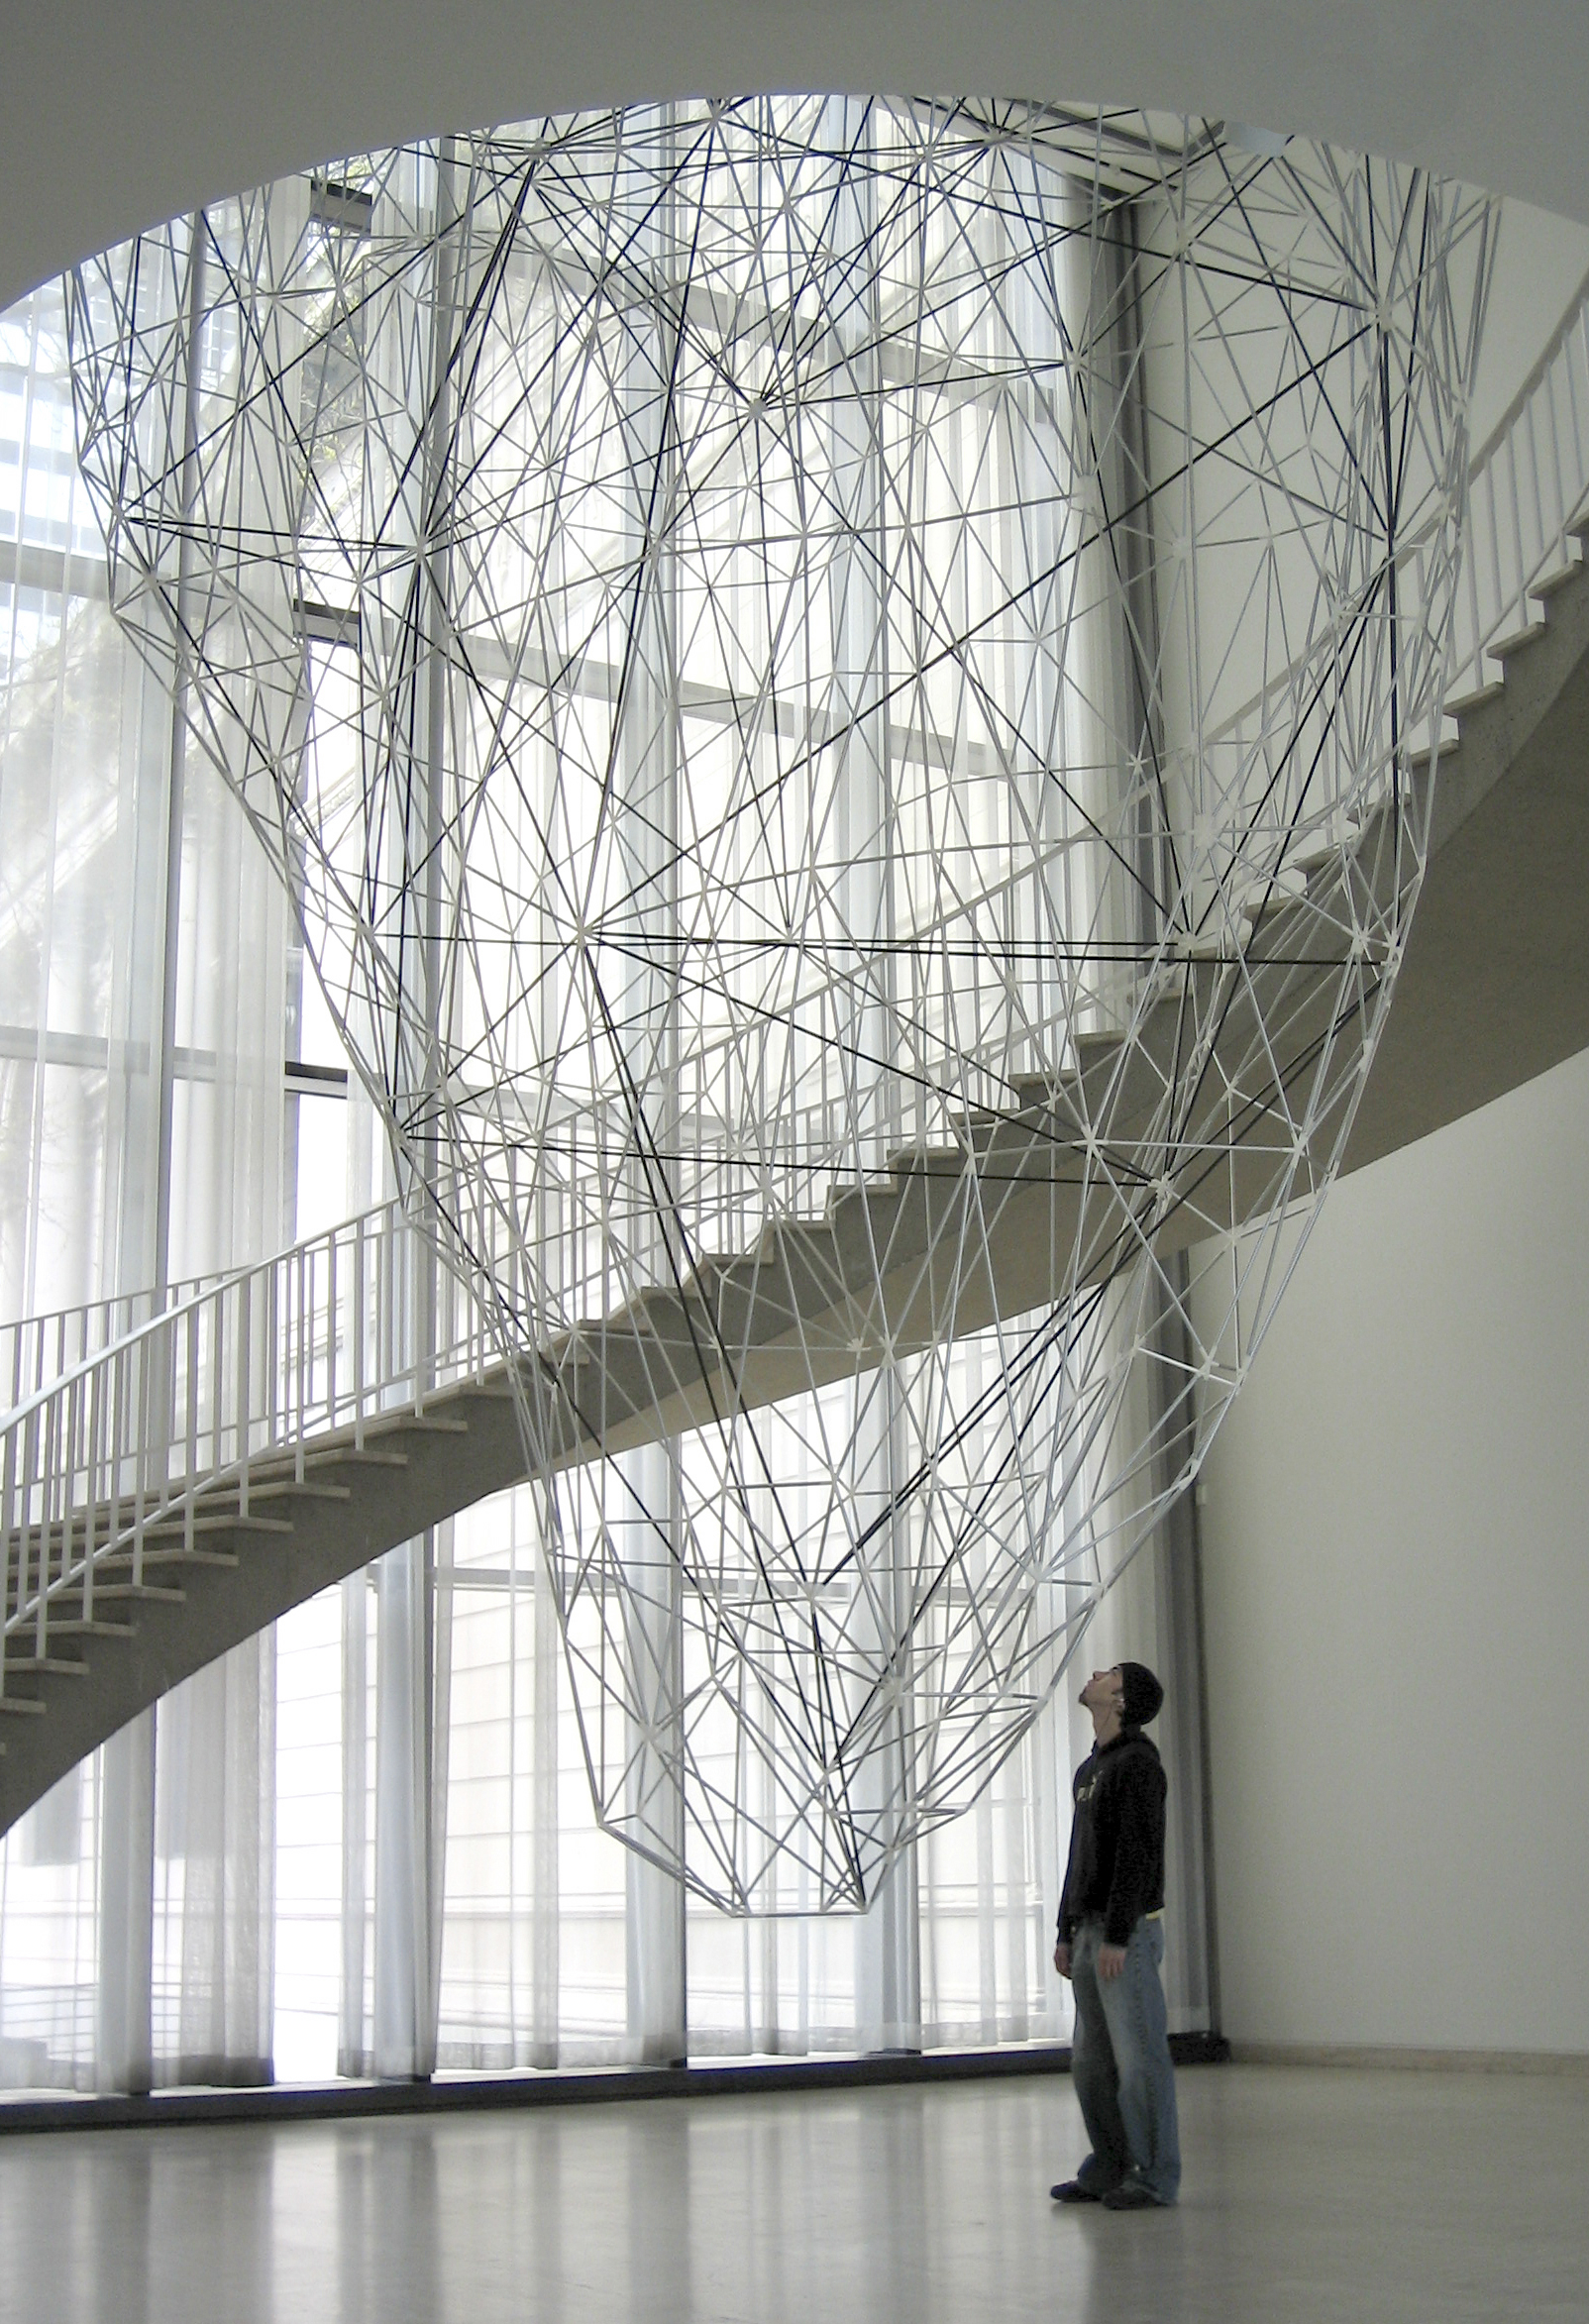 Iñigo Manglano-Ovalle, Iceberg, installation view, Art Institute of Chicago, IL, 2005